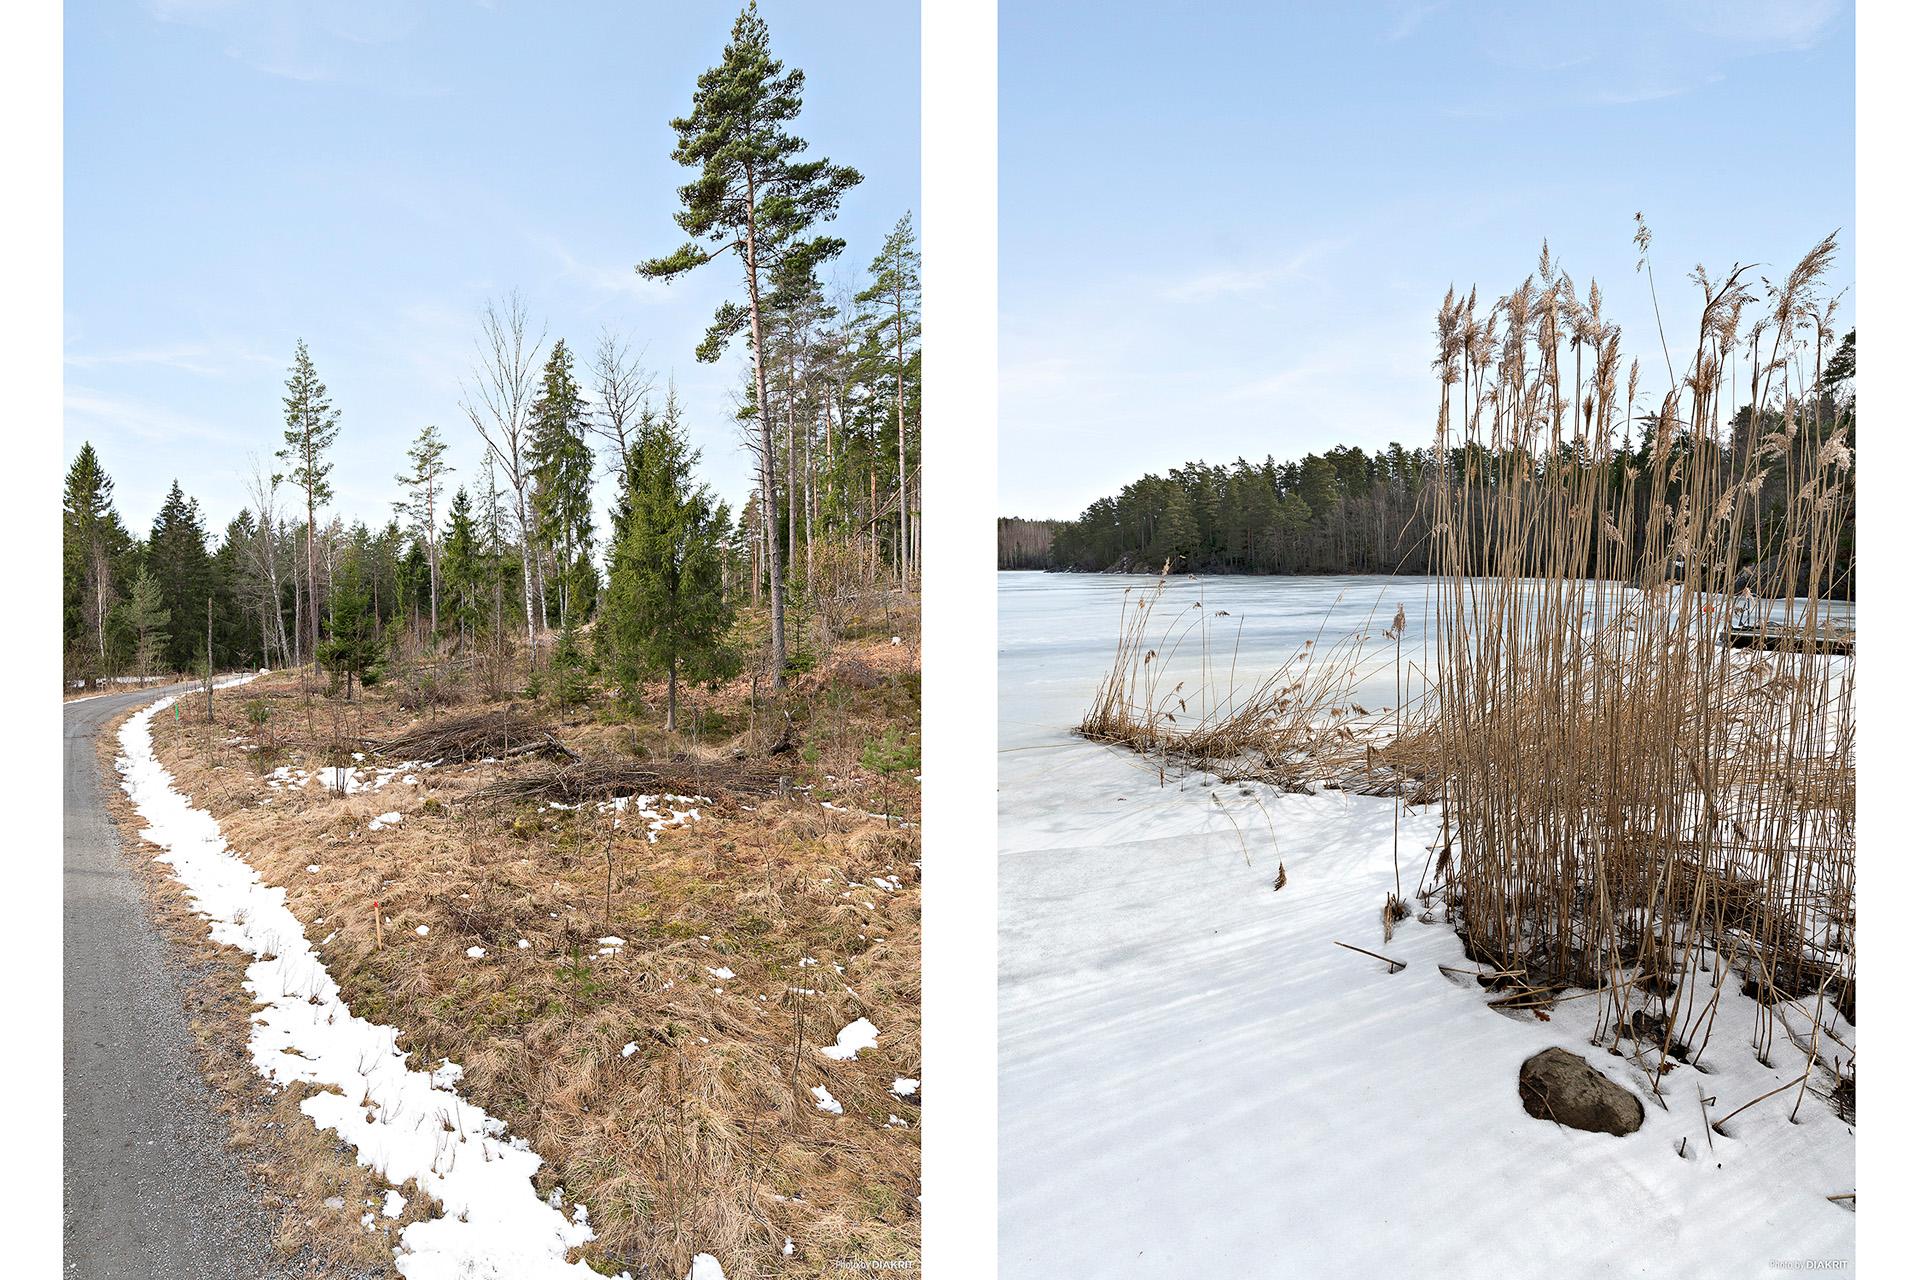 Skogsmiljö nära vatten